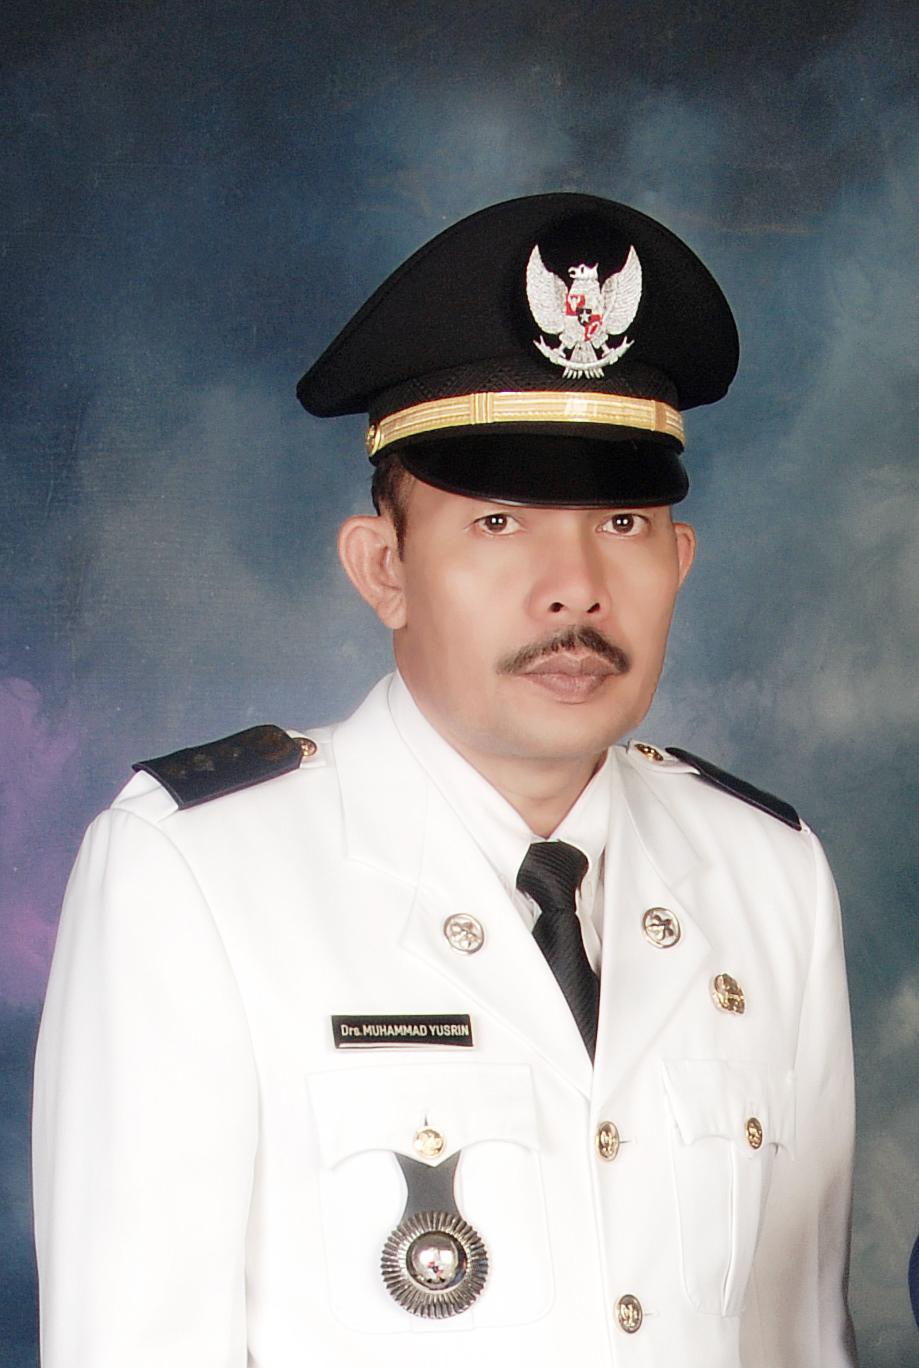 Camat+Banjarmasin+Barat+Drs.+M.+Yusrin.jpg (919×1368)